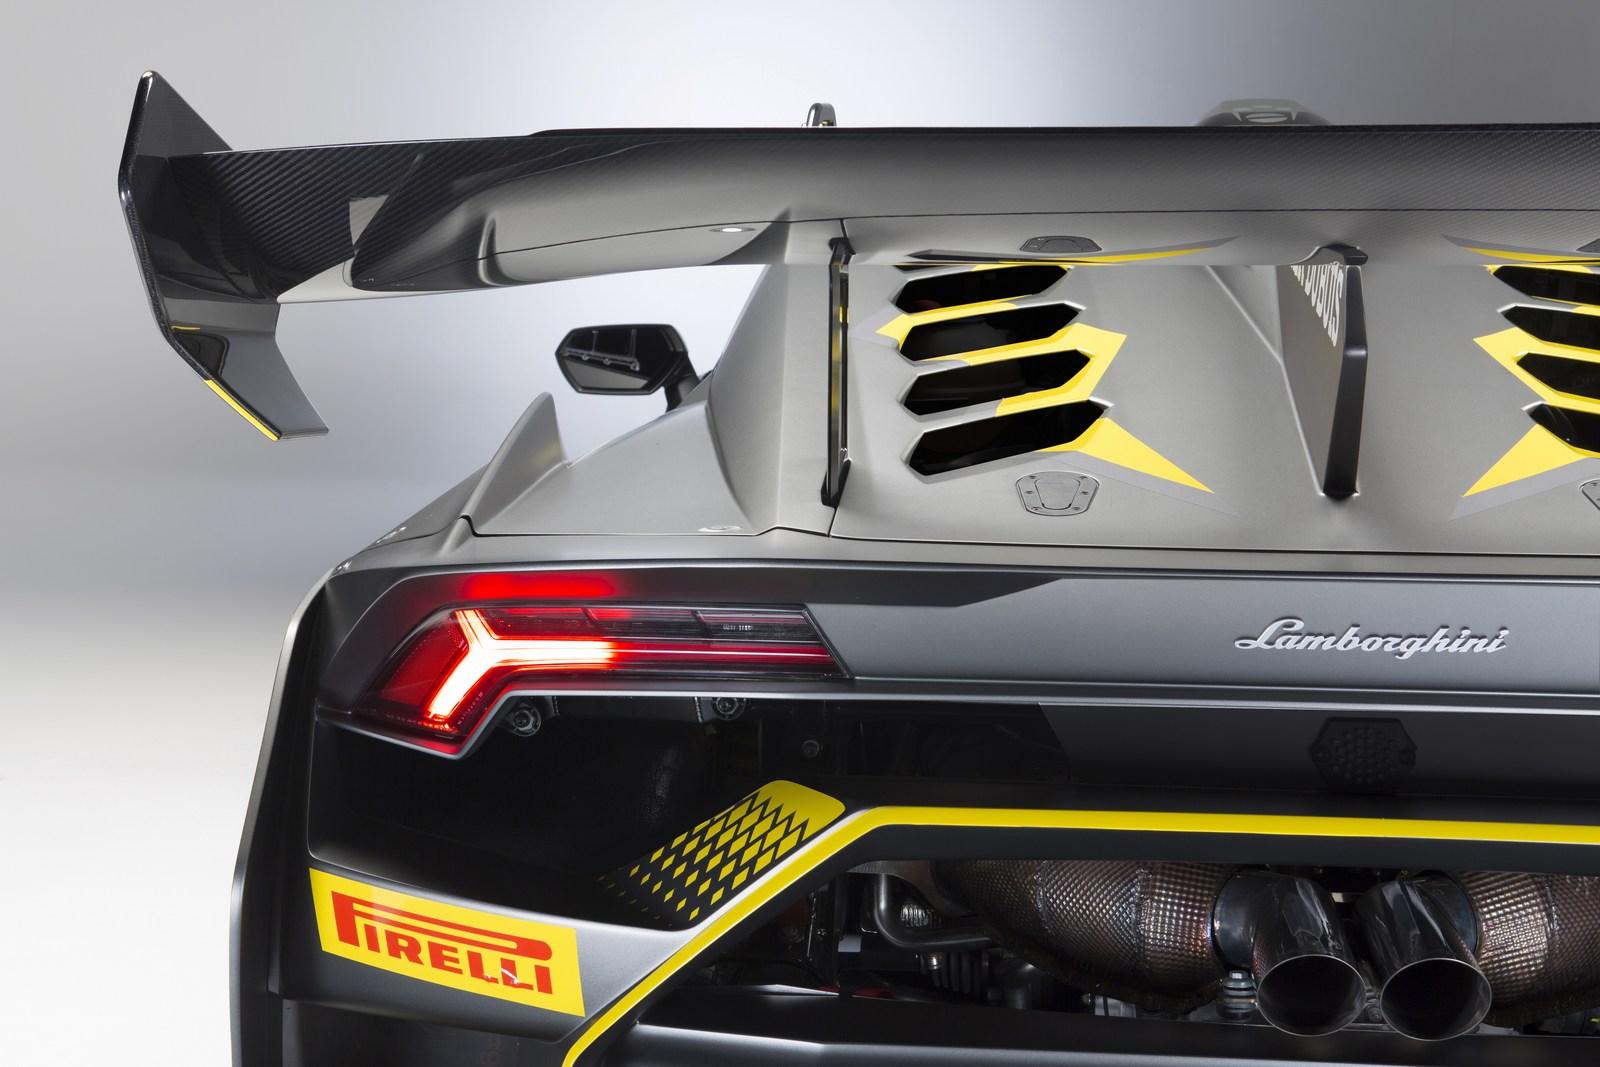 Lamborghini_Huracan_Super_Trofeo_Evo_04